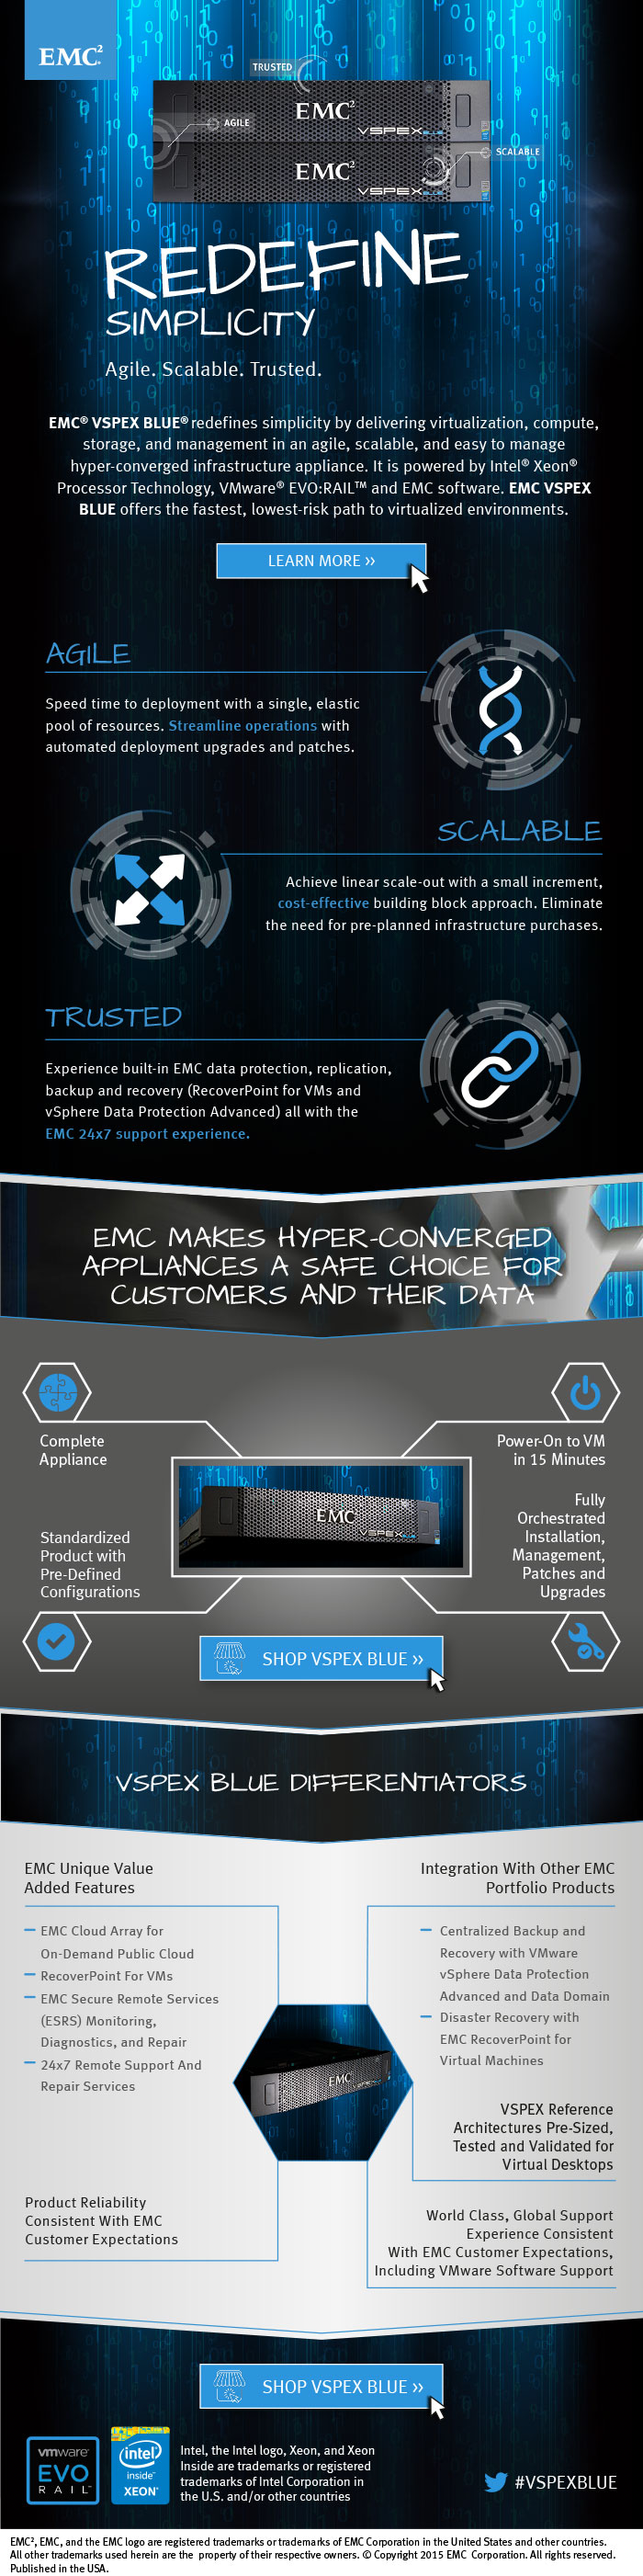 Vspex Blue Redefines Simplicity Hyper Converged Infrastructure Emc Infrastructure Innovation Technology Infographic